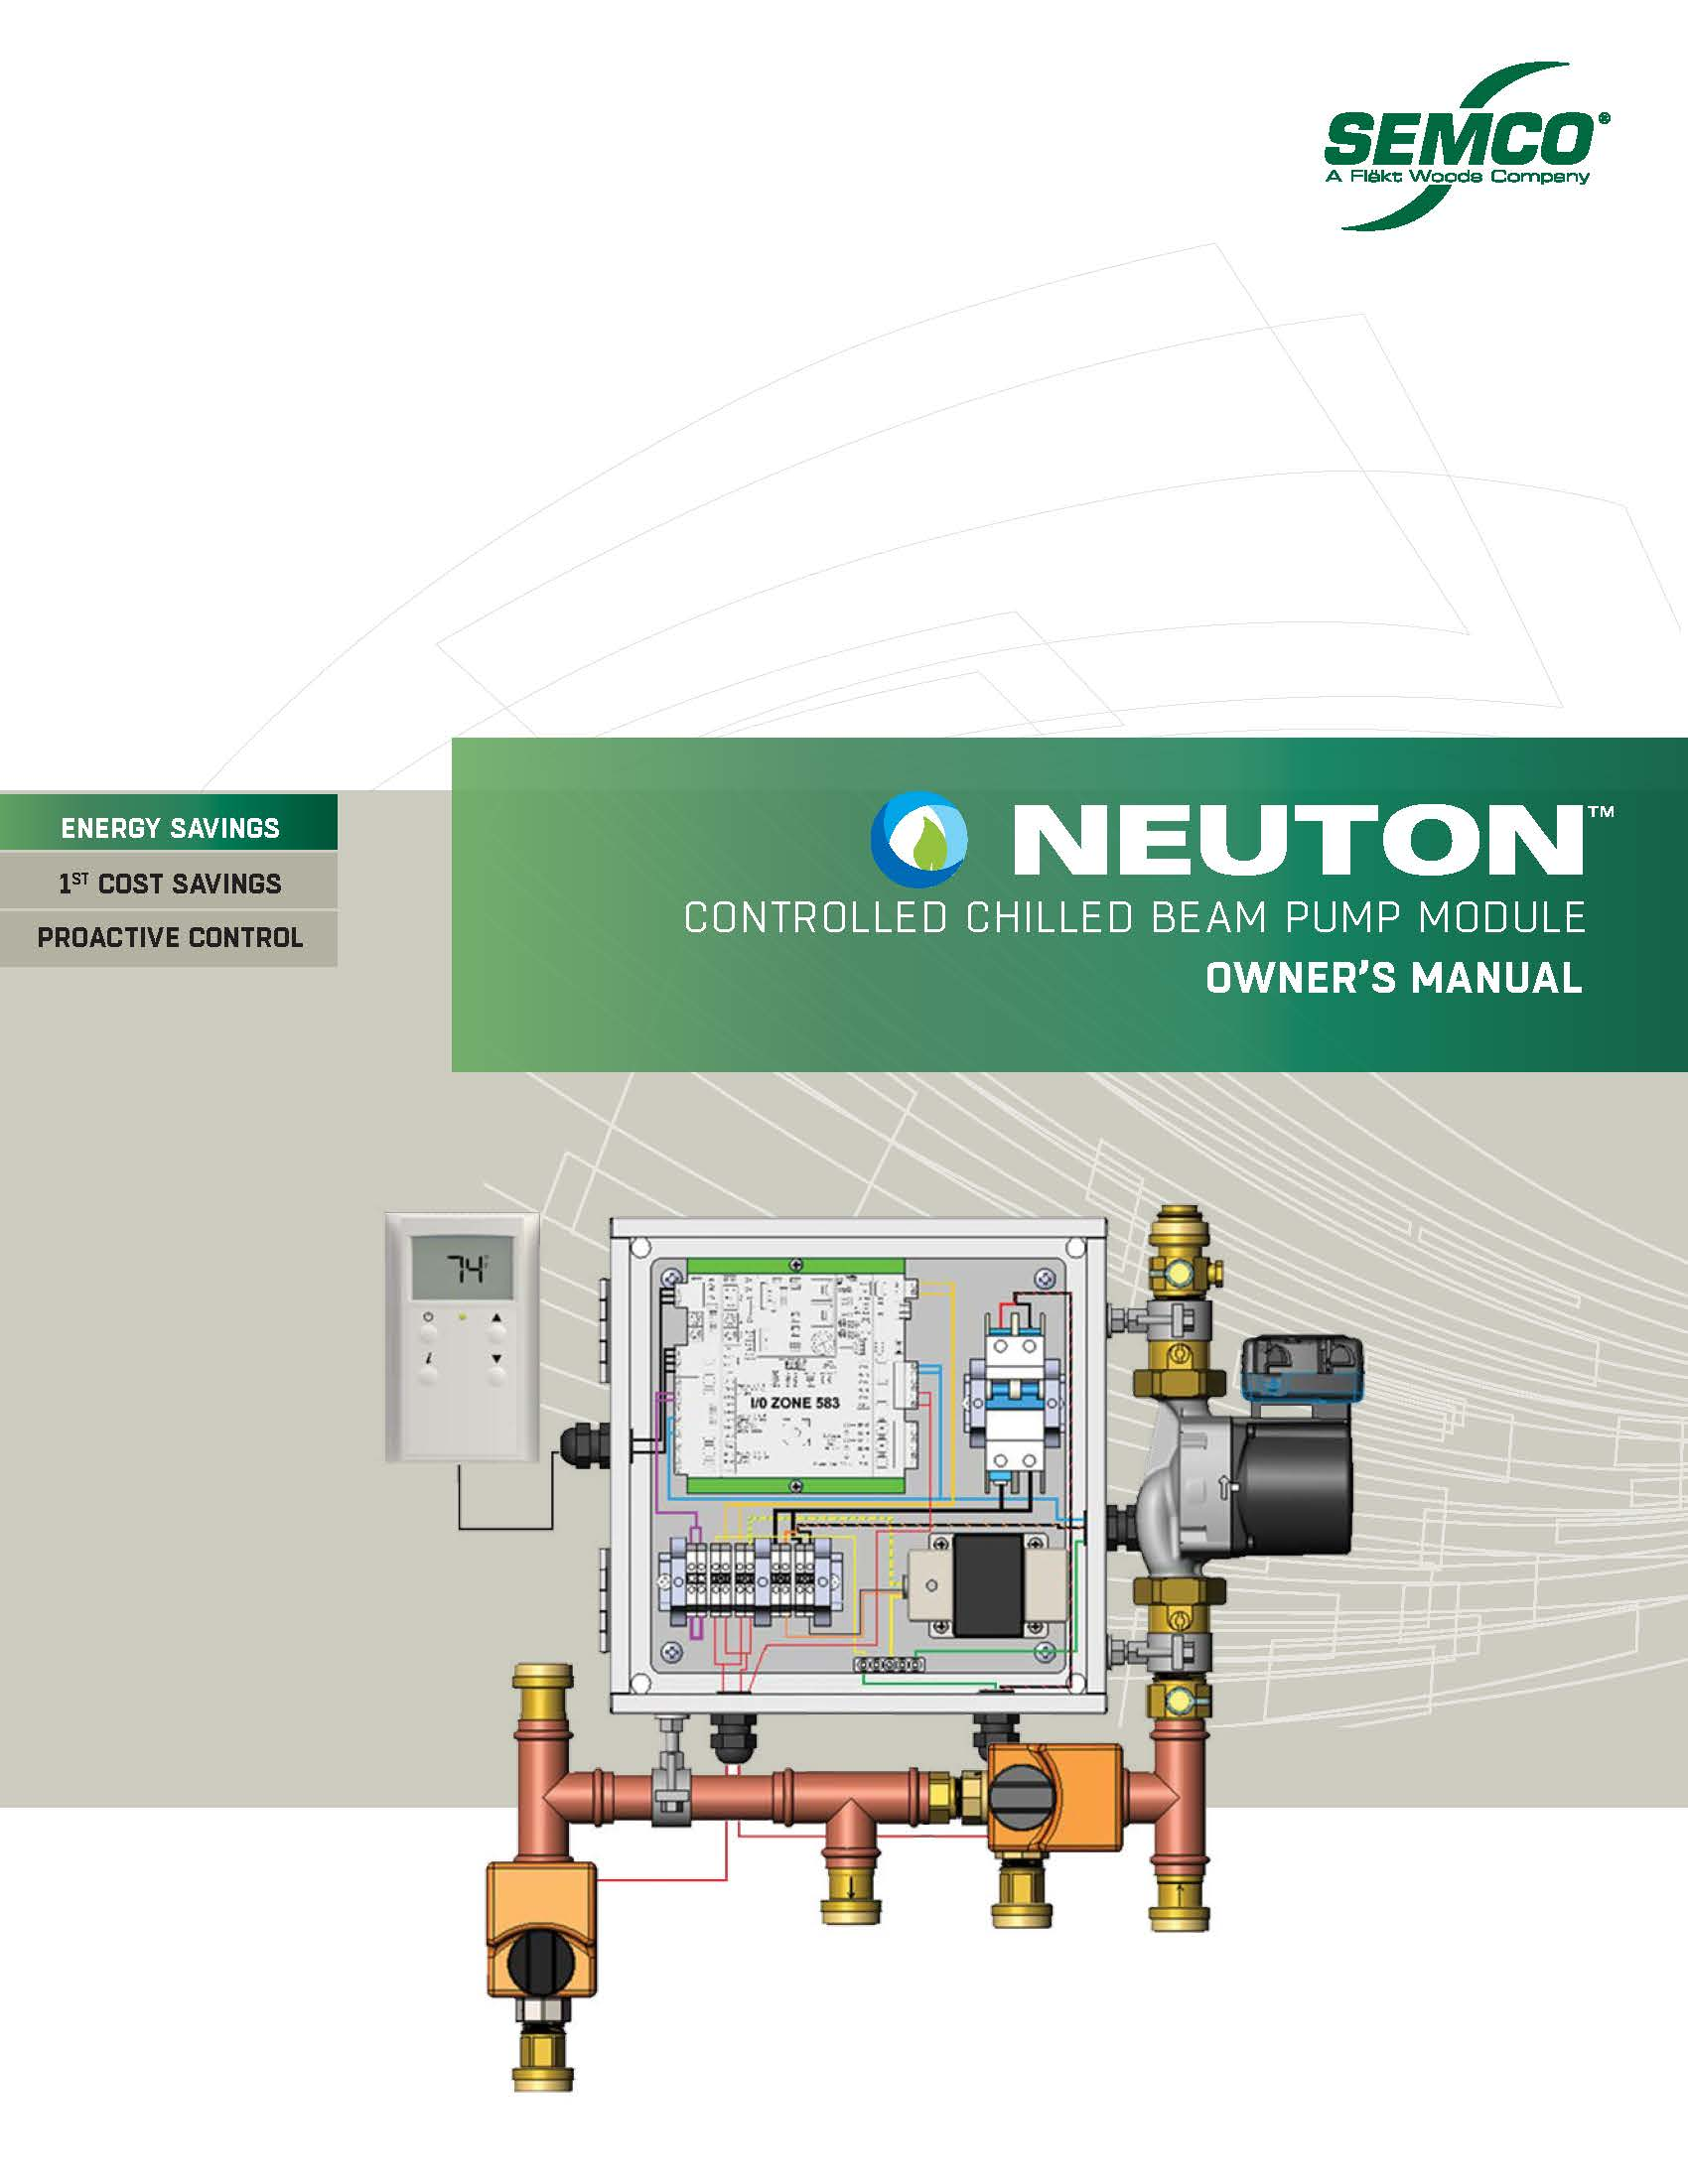 NEUTON_Owners_Manual_-_SEMCO_04-16.jpg